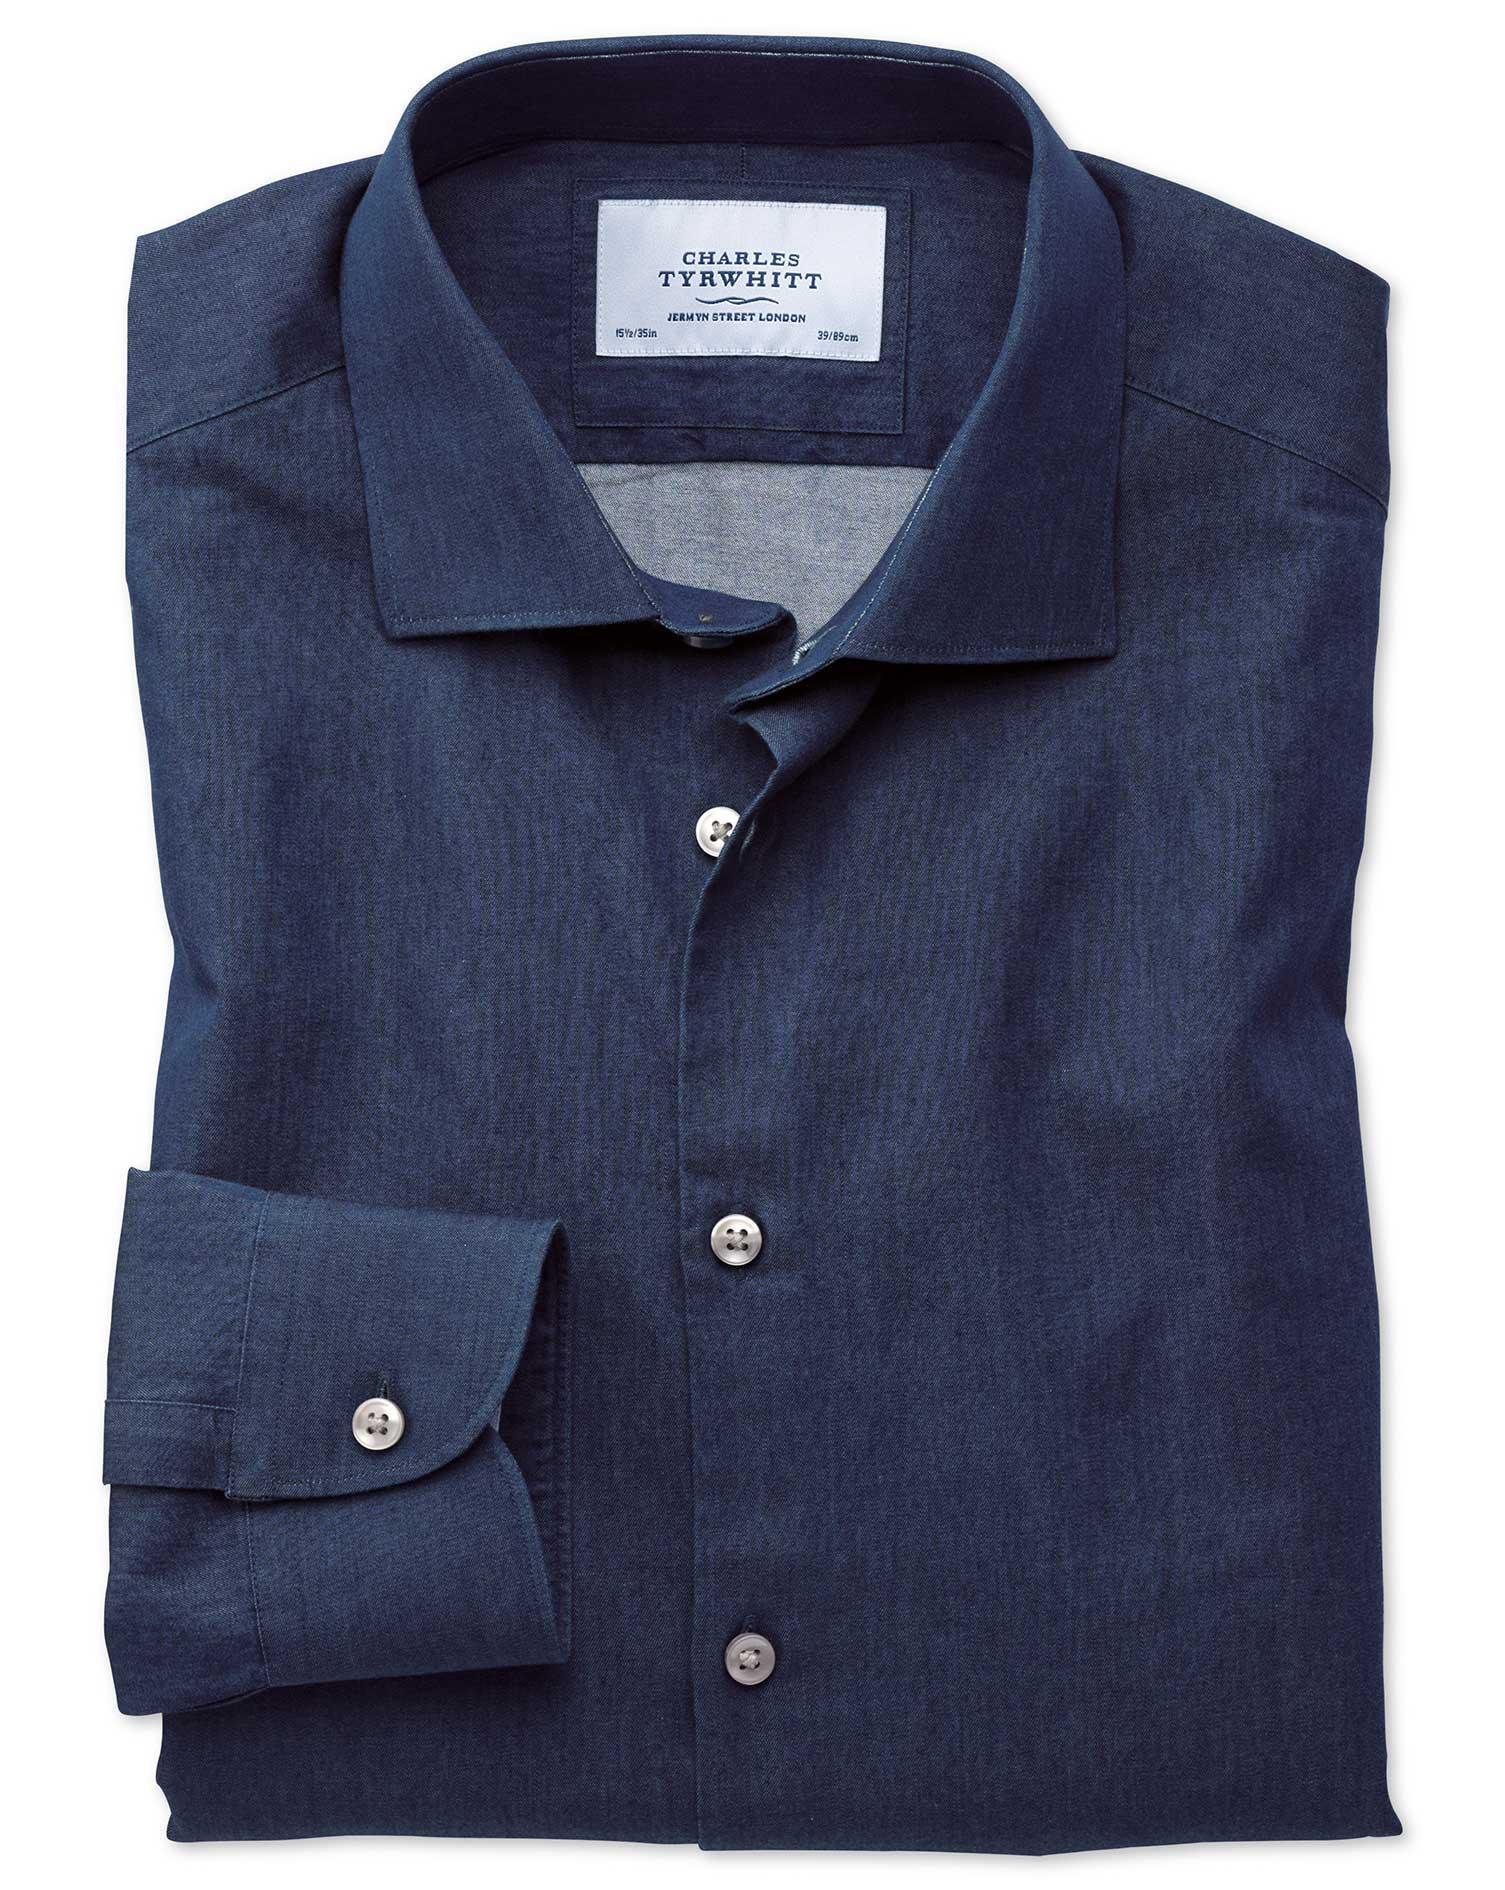 Extra Slim Fit Semi-Cutaway Business Casual Indigo Dark Blue Cotton Formal Shirt Single Cuff Size 14